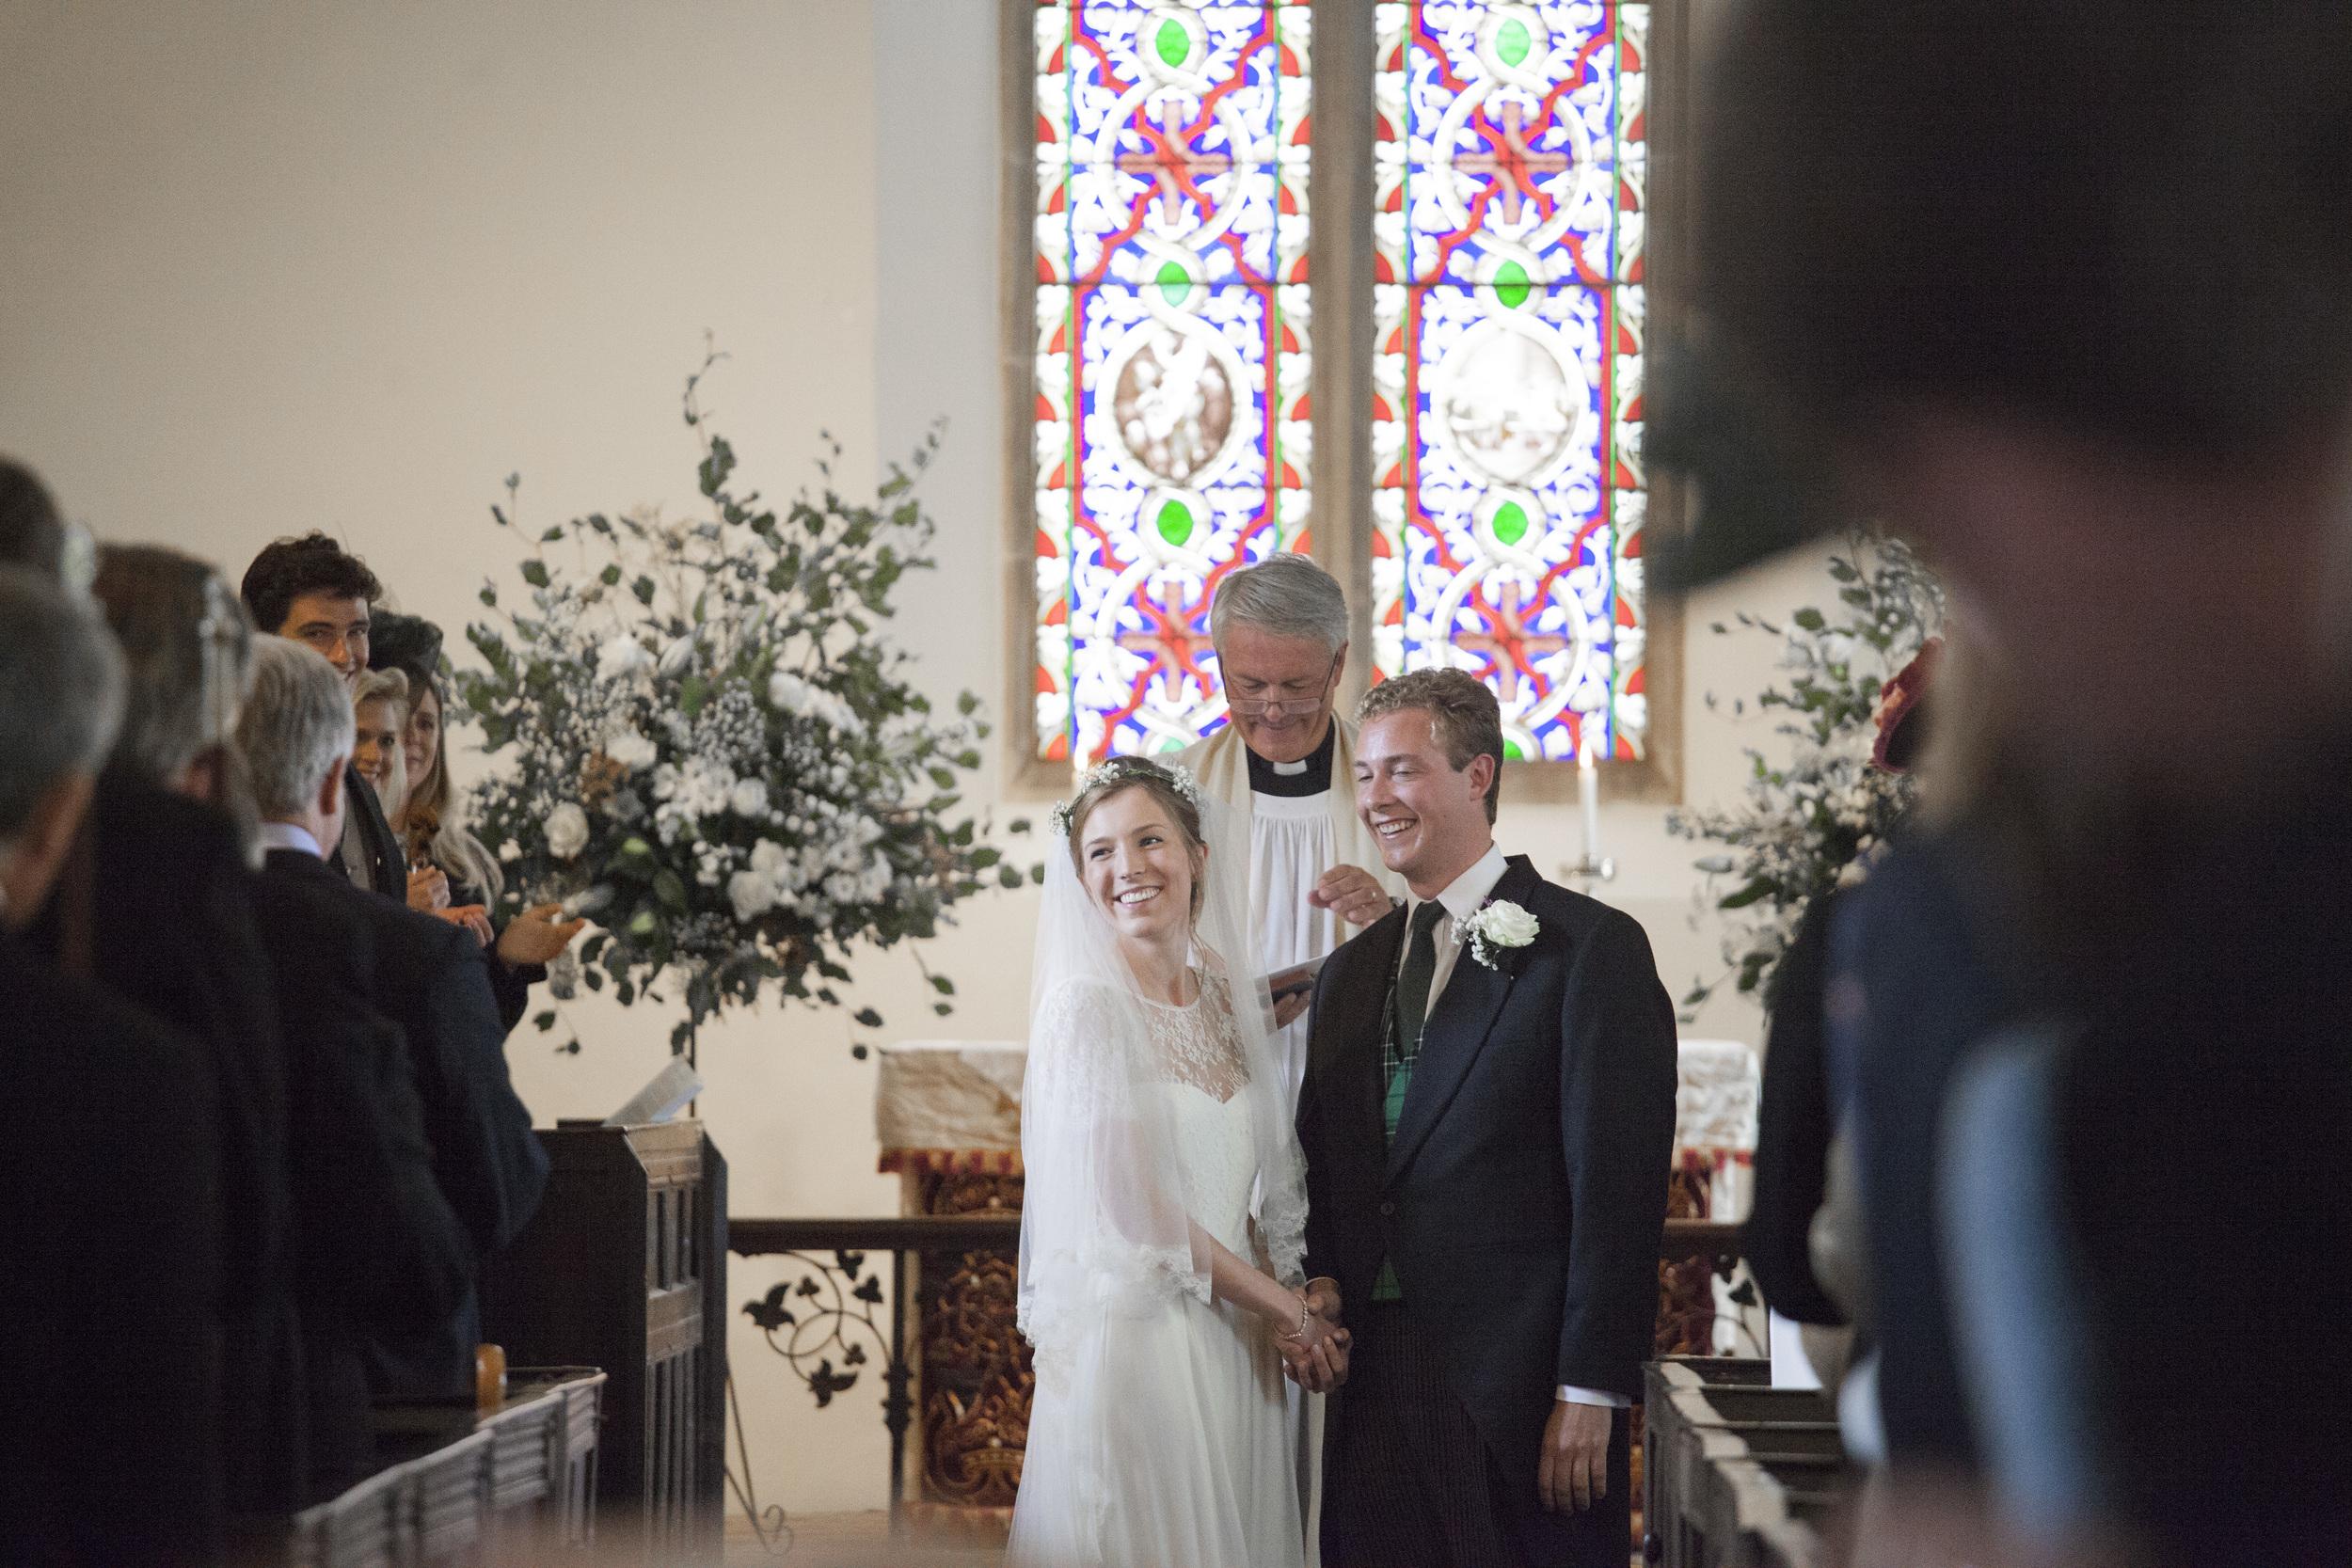 A-Sophie-Ralph-Shropshire-Wedding-Edit_80.jpg